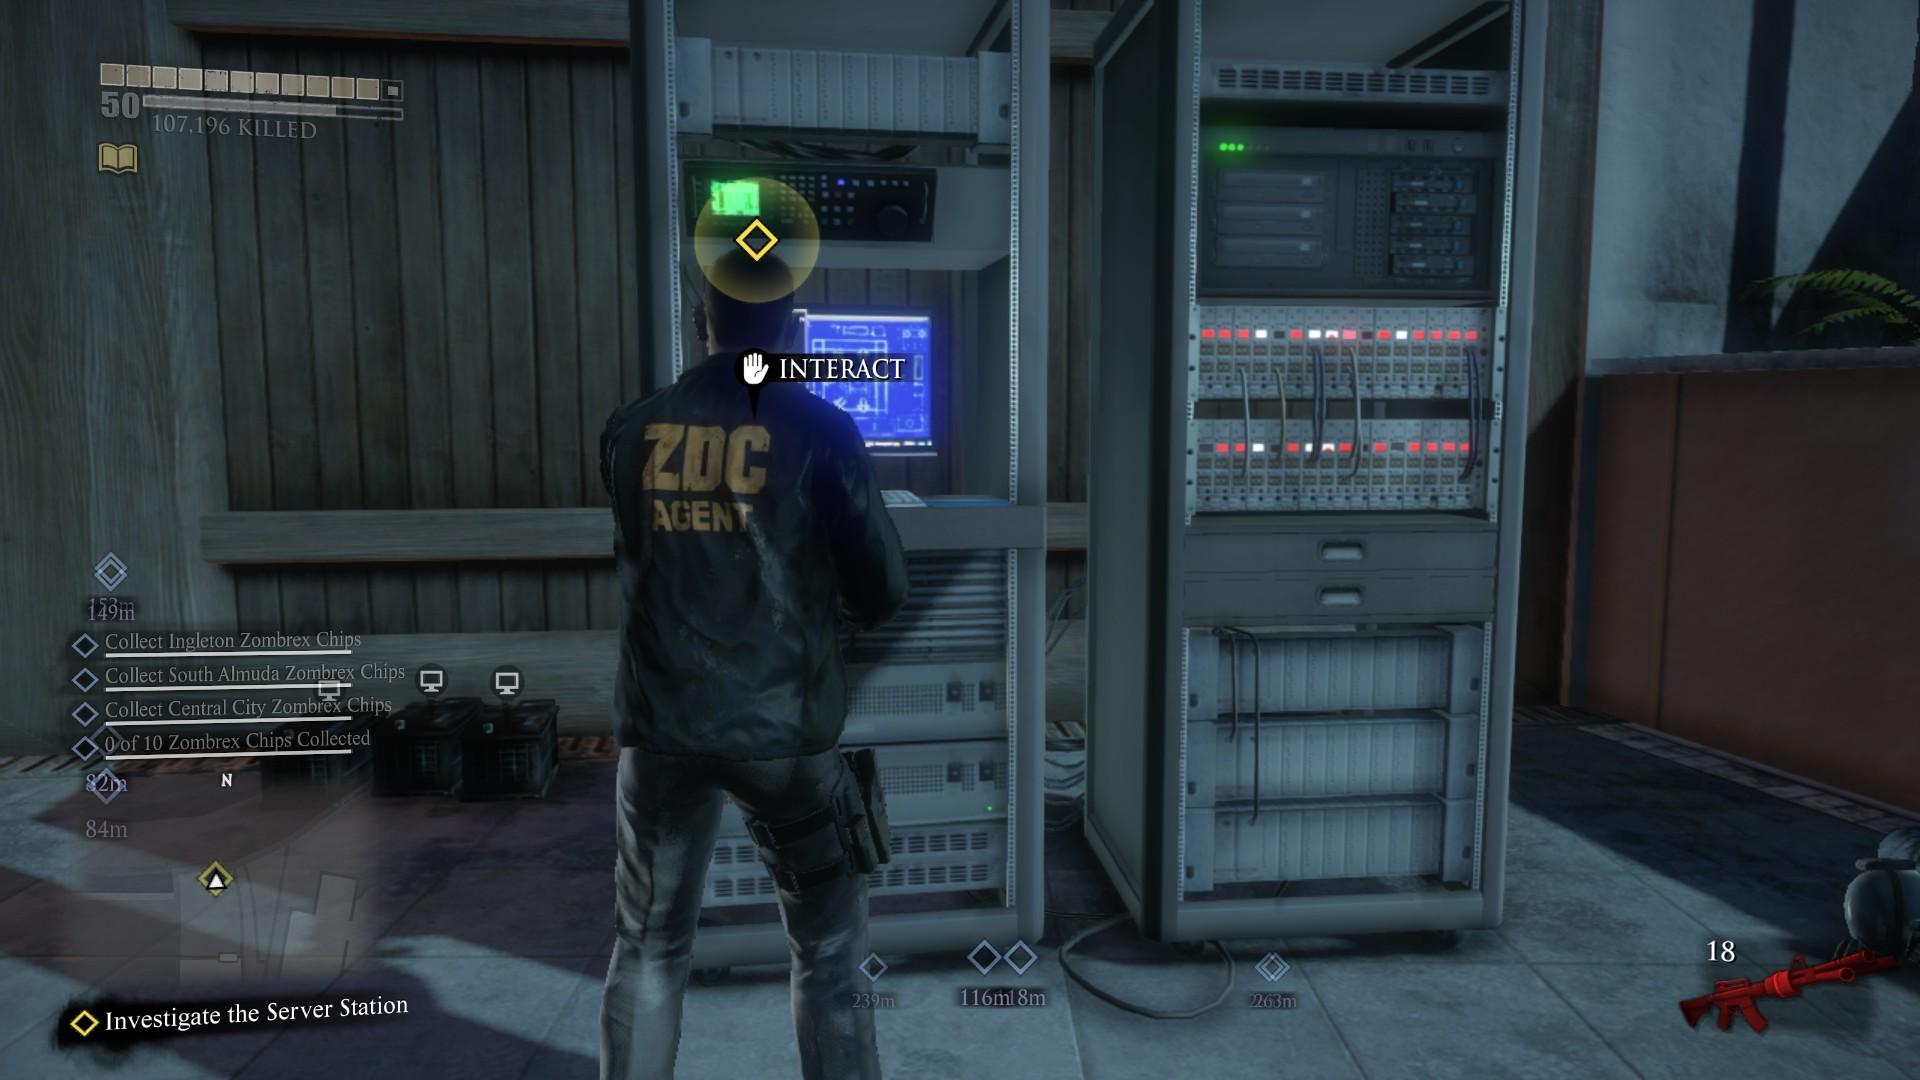 Investigate the Server Station